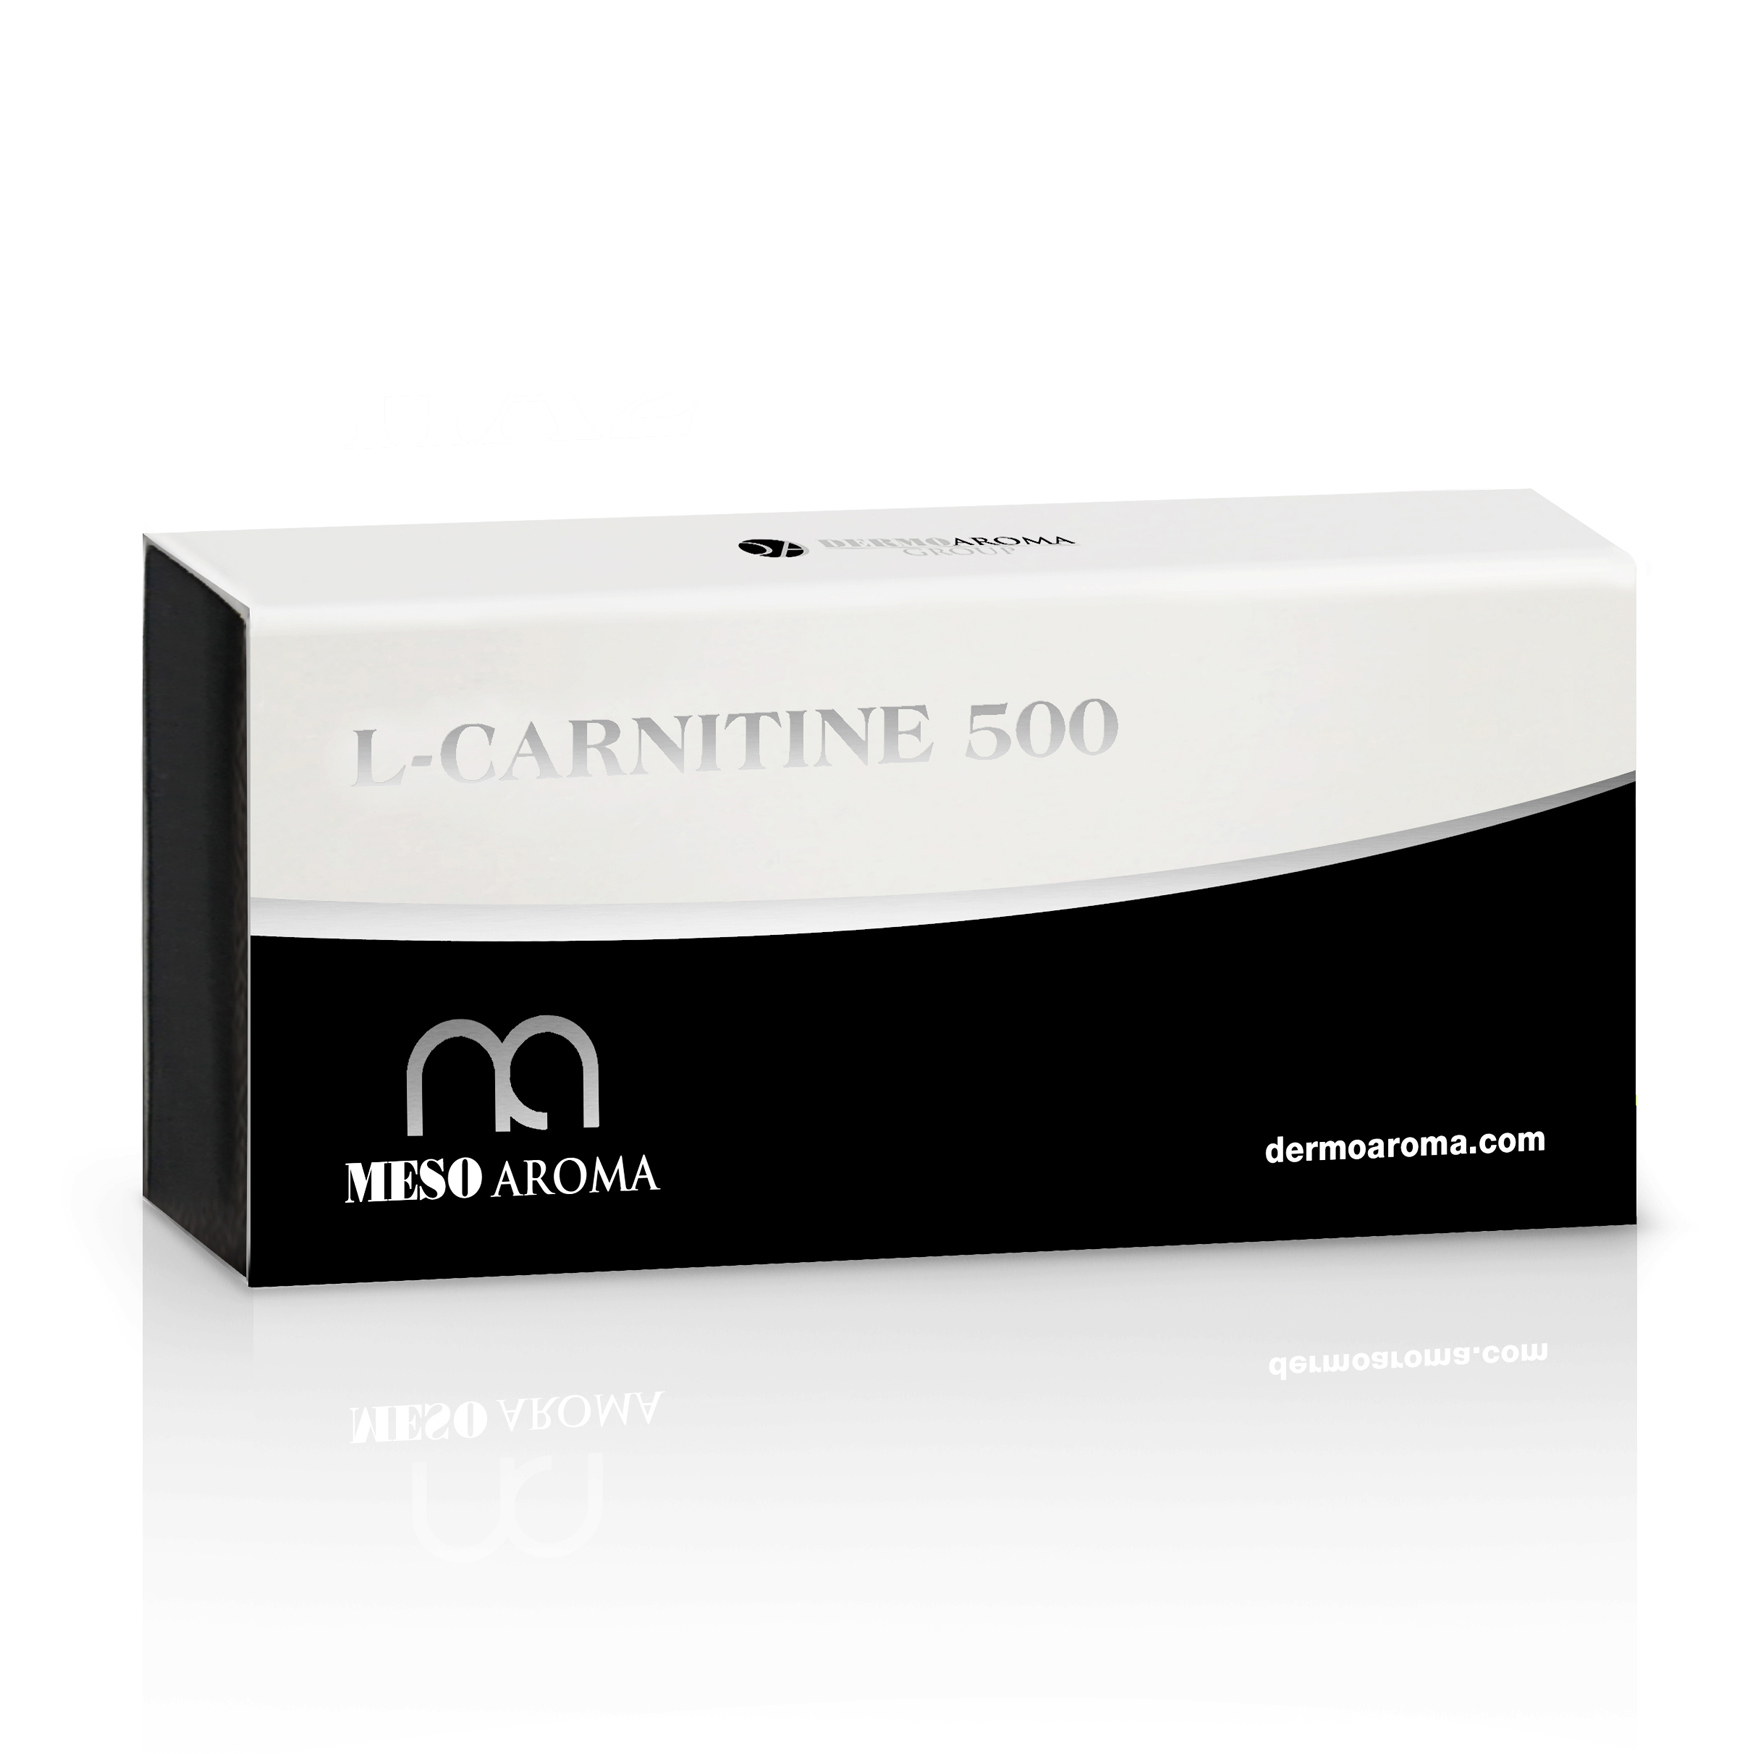 Mesoaroma-ampułki-do-mezoterapii-L-CARNITINE-500